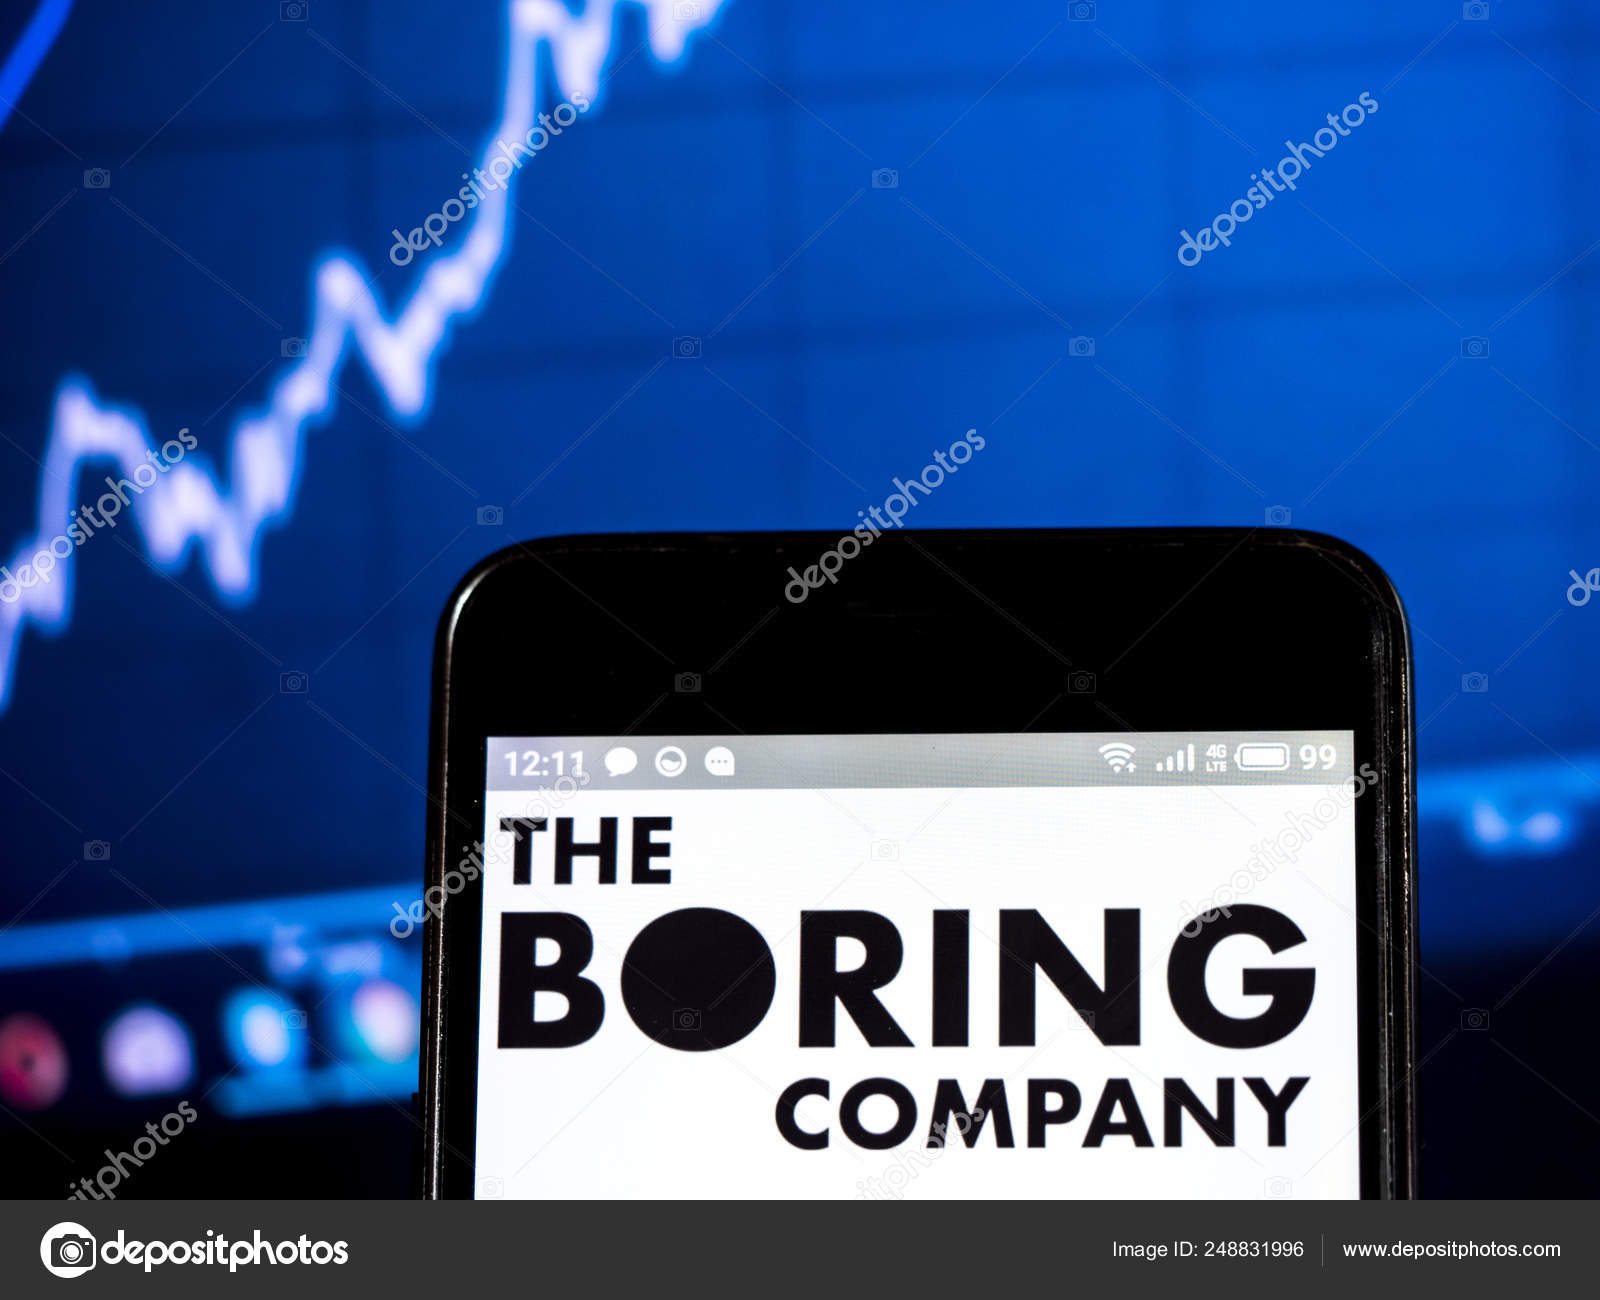 The Boring Company logo seen displayed on smart phone